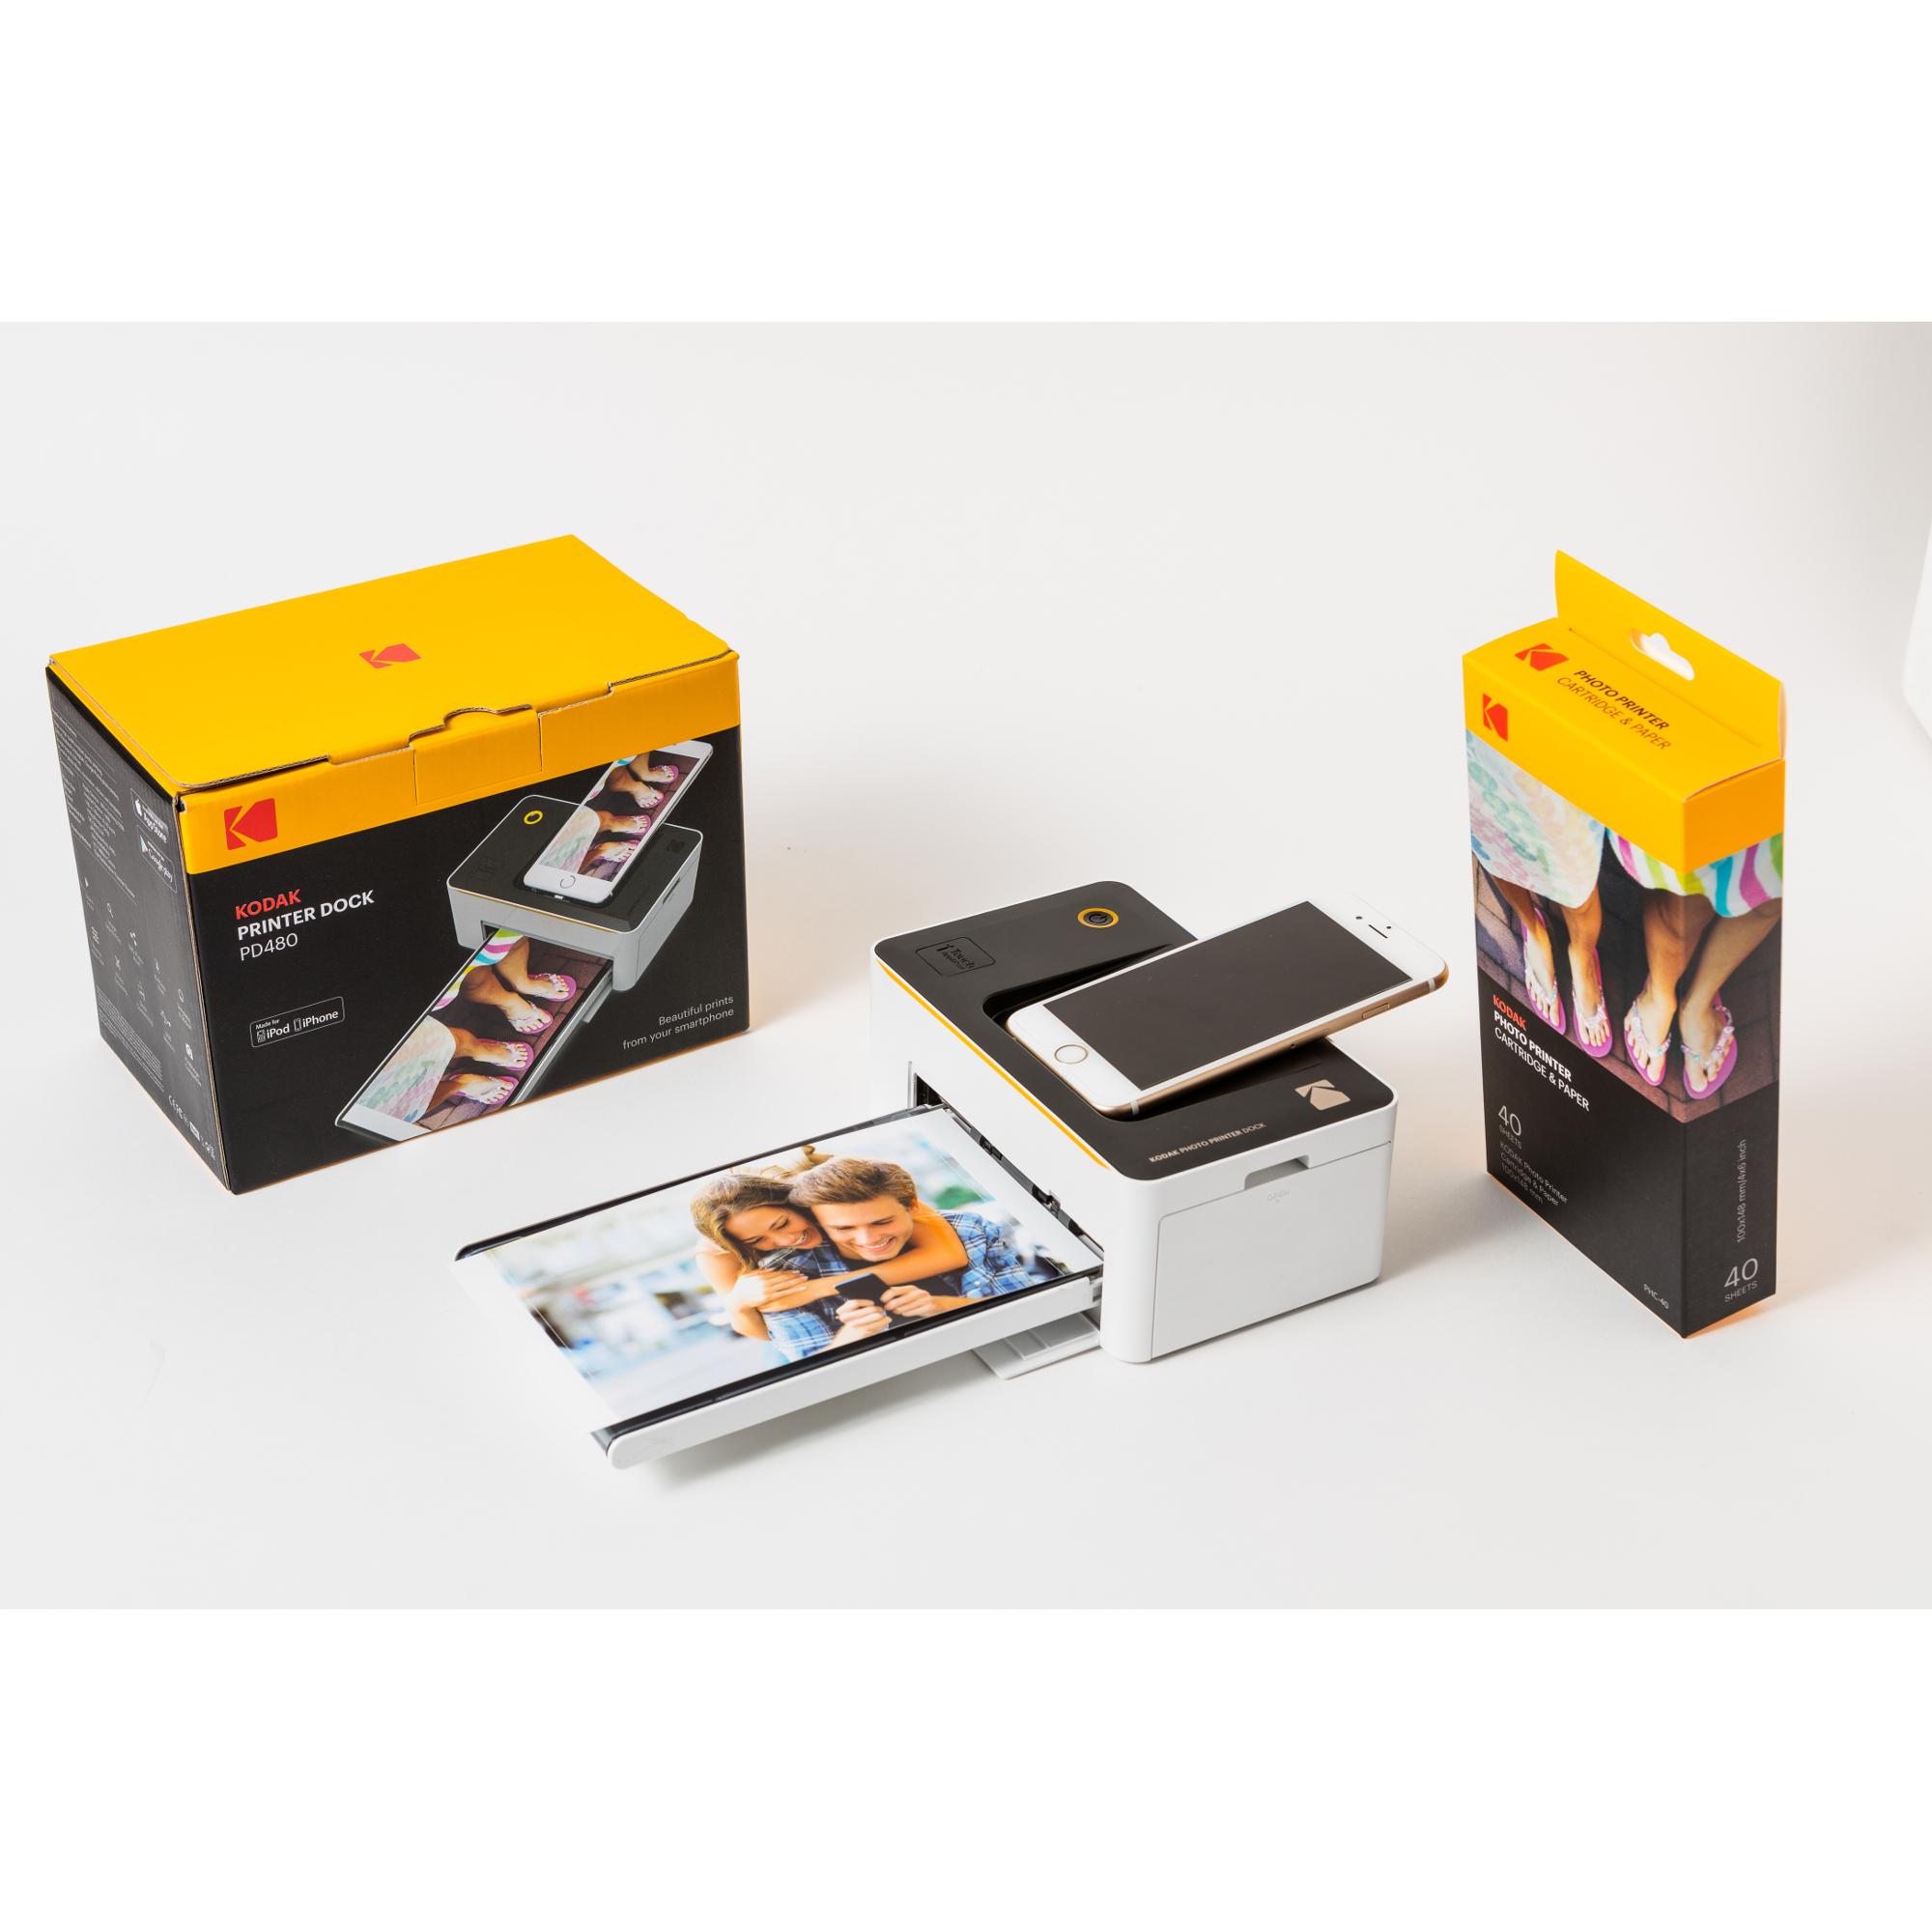 Imprimante dock Kodak